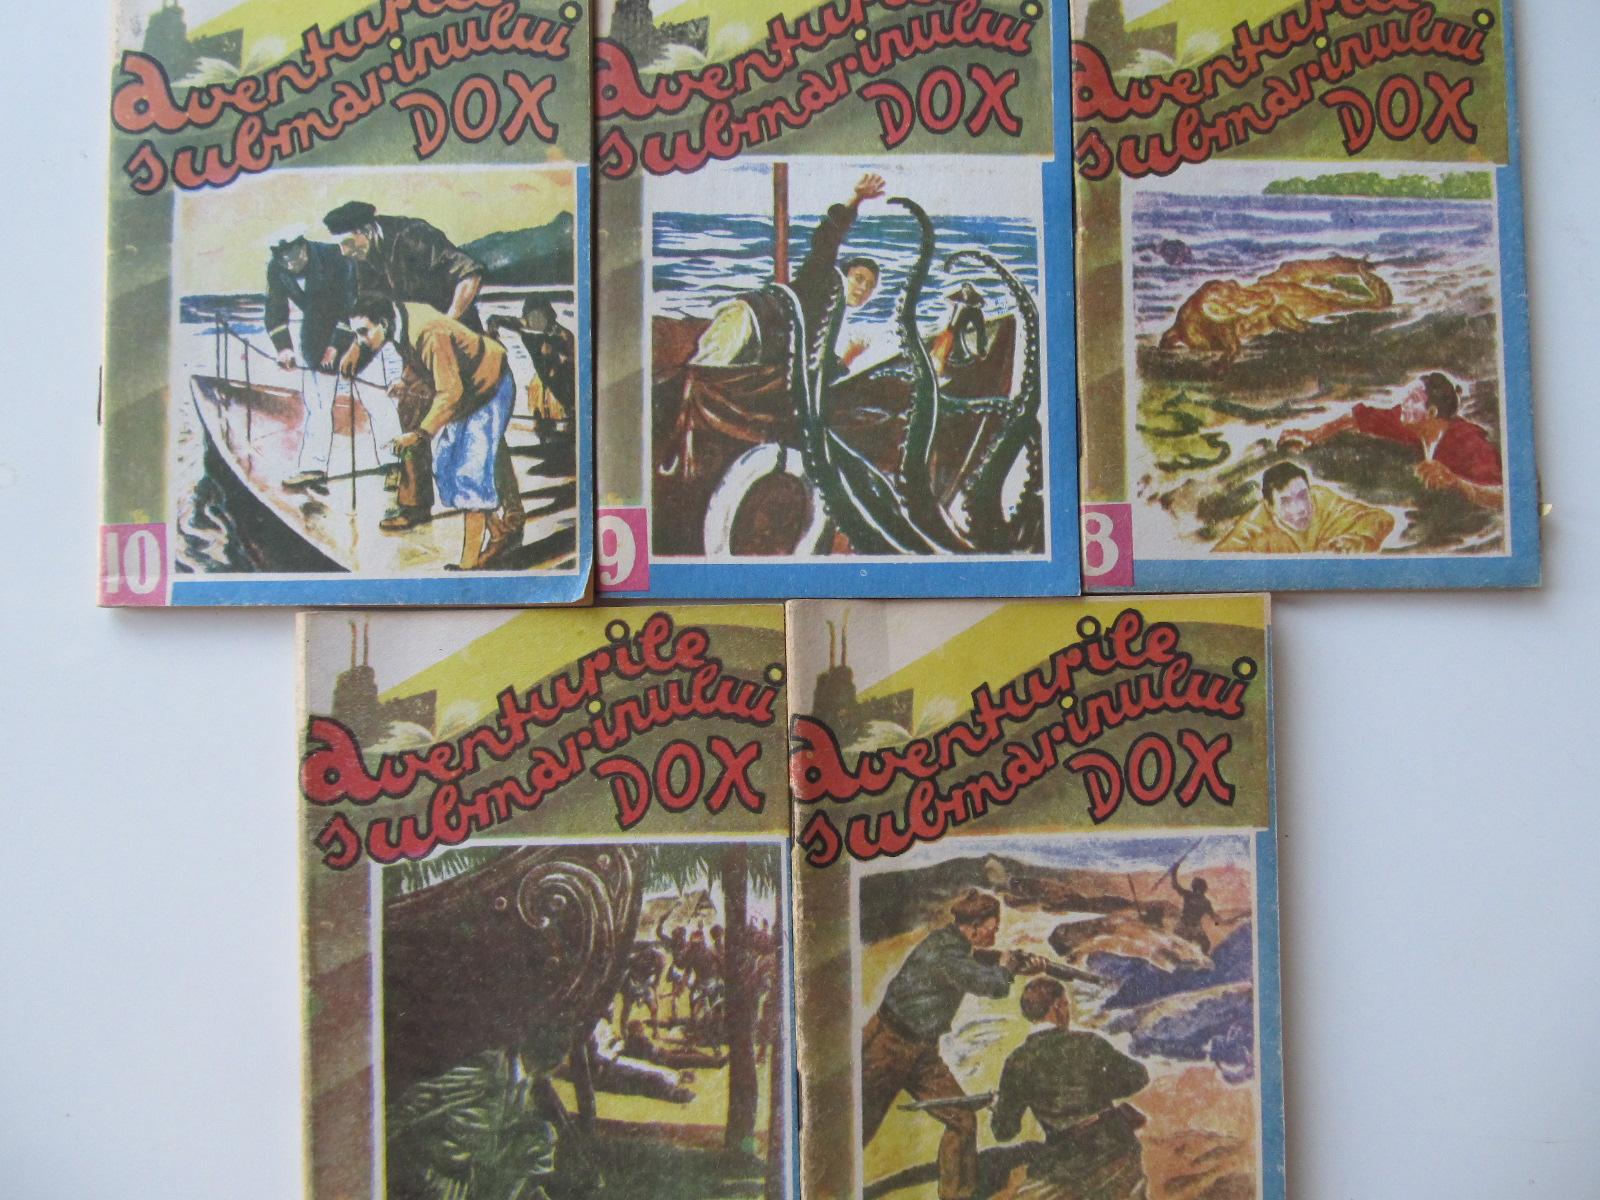 Aventurile submarinului Dox (6) , (7) , (8) , (9) , (10) - 5 numere - Henry Warren | Detalii carte